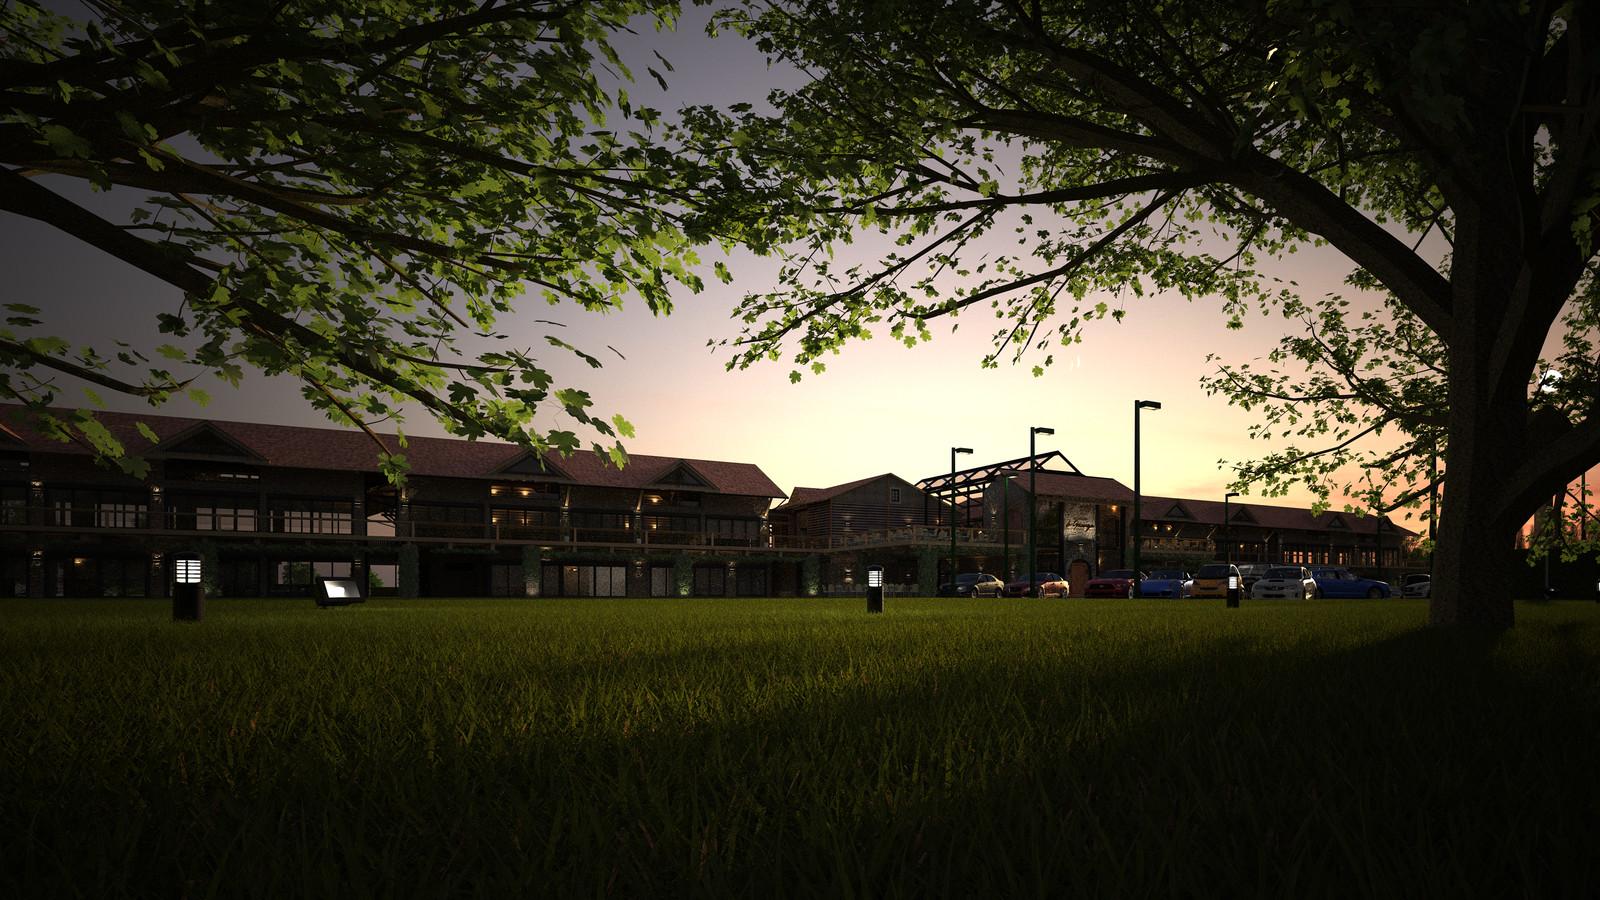 Original model from 2014 La Grange- Rivendell Resort: NE Campestre to Center 02B 02 SU + Thea Render